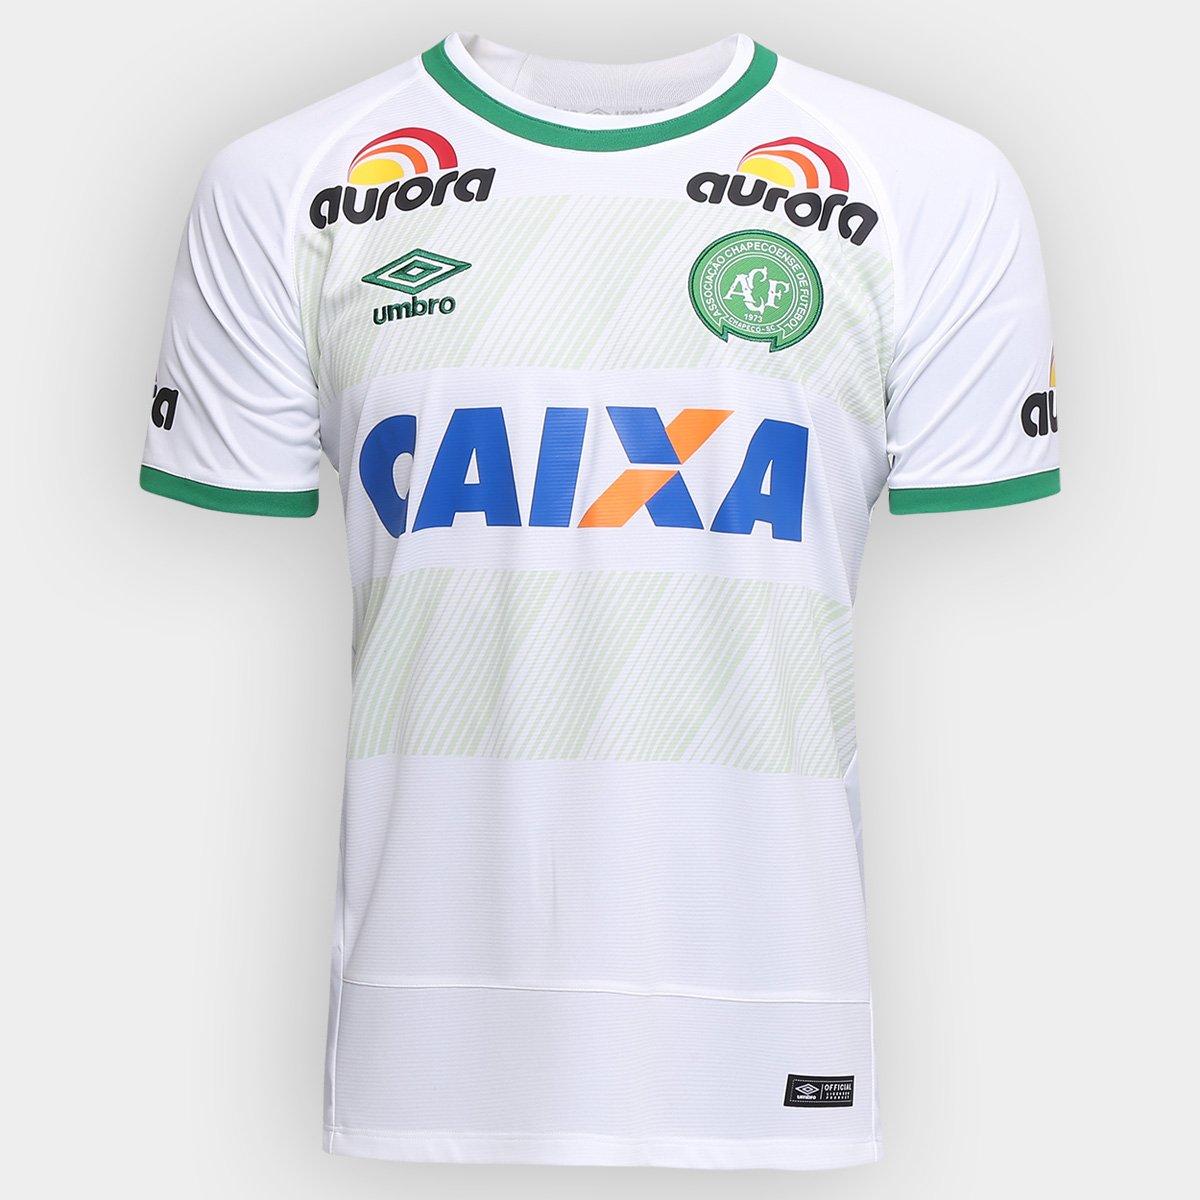 f7578dcf51 Camisa Chapecoense II 2016 s/nº Torcedor Umbro Masculina - Branco e Verde |  Loja da Chape